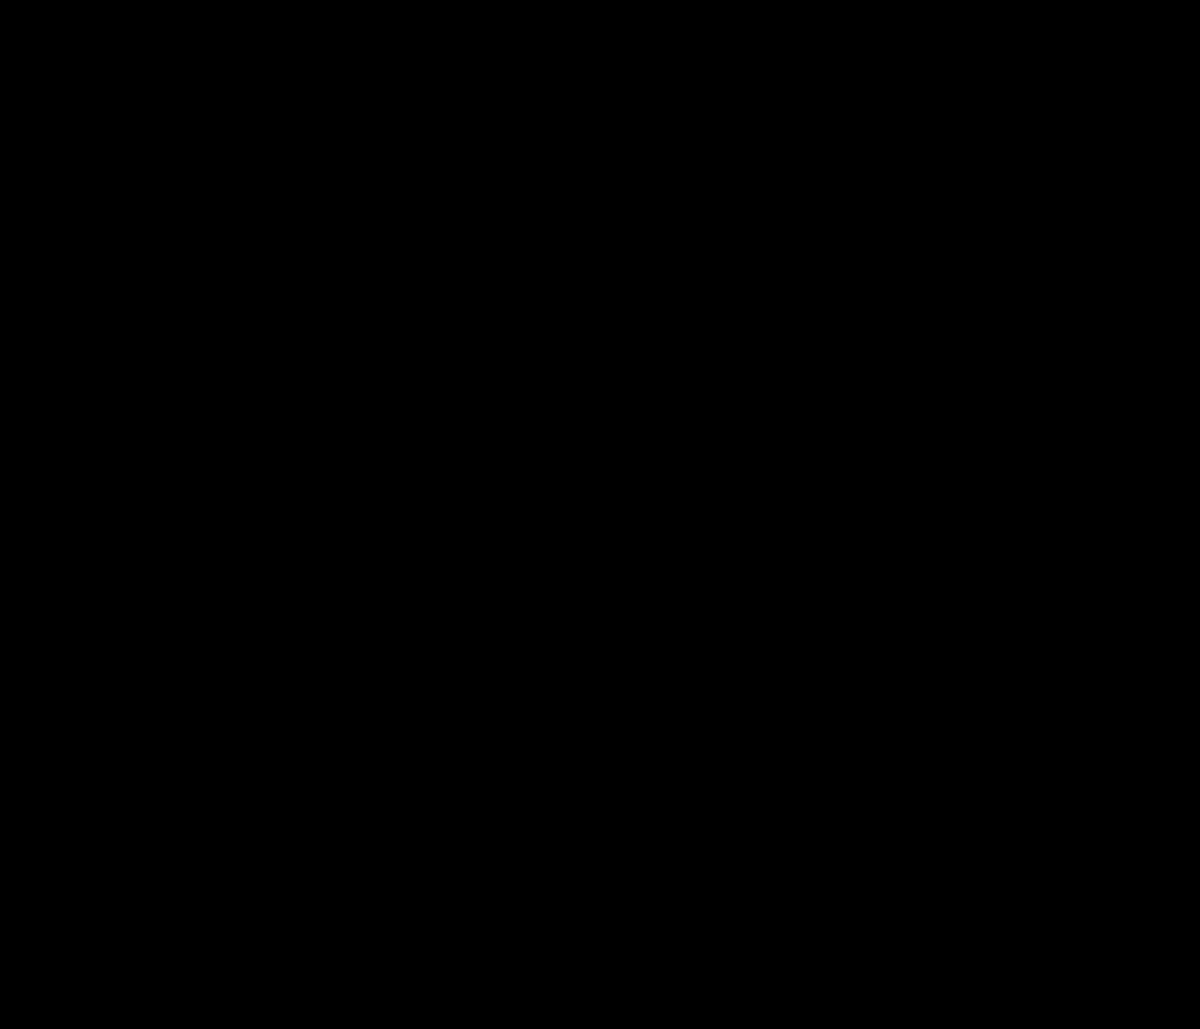 Simvastatina estructura